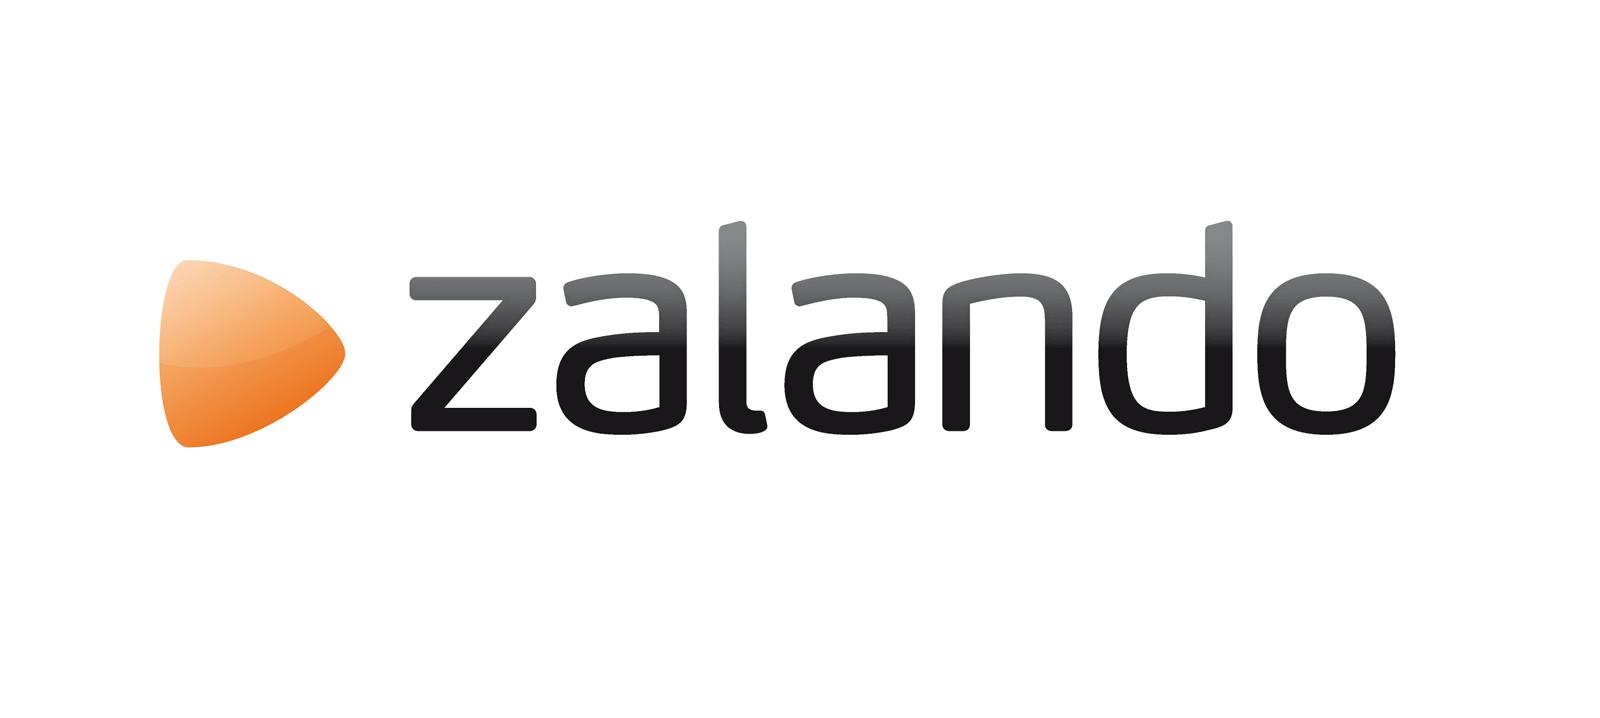 polski start-up